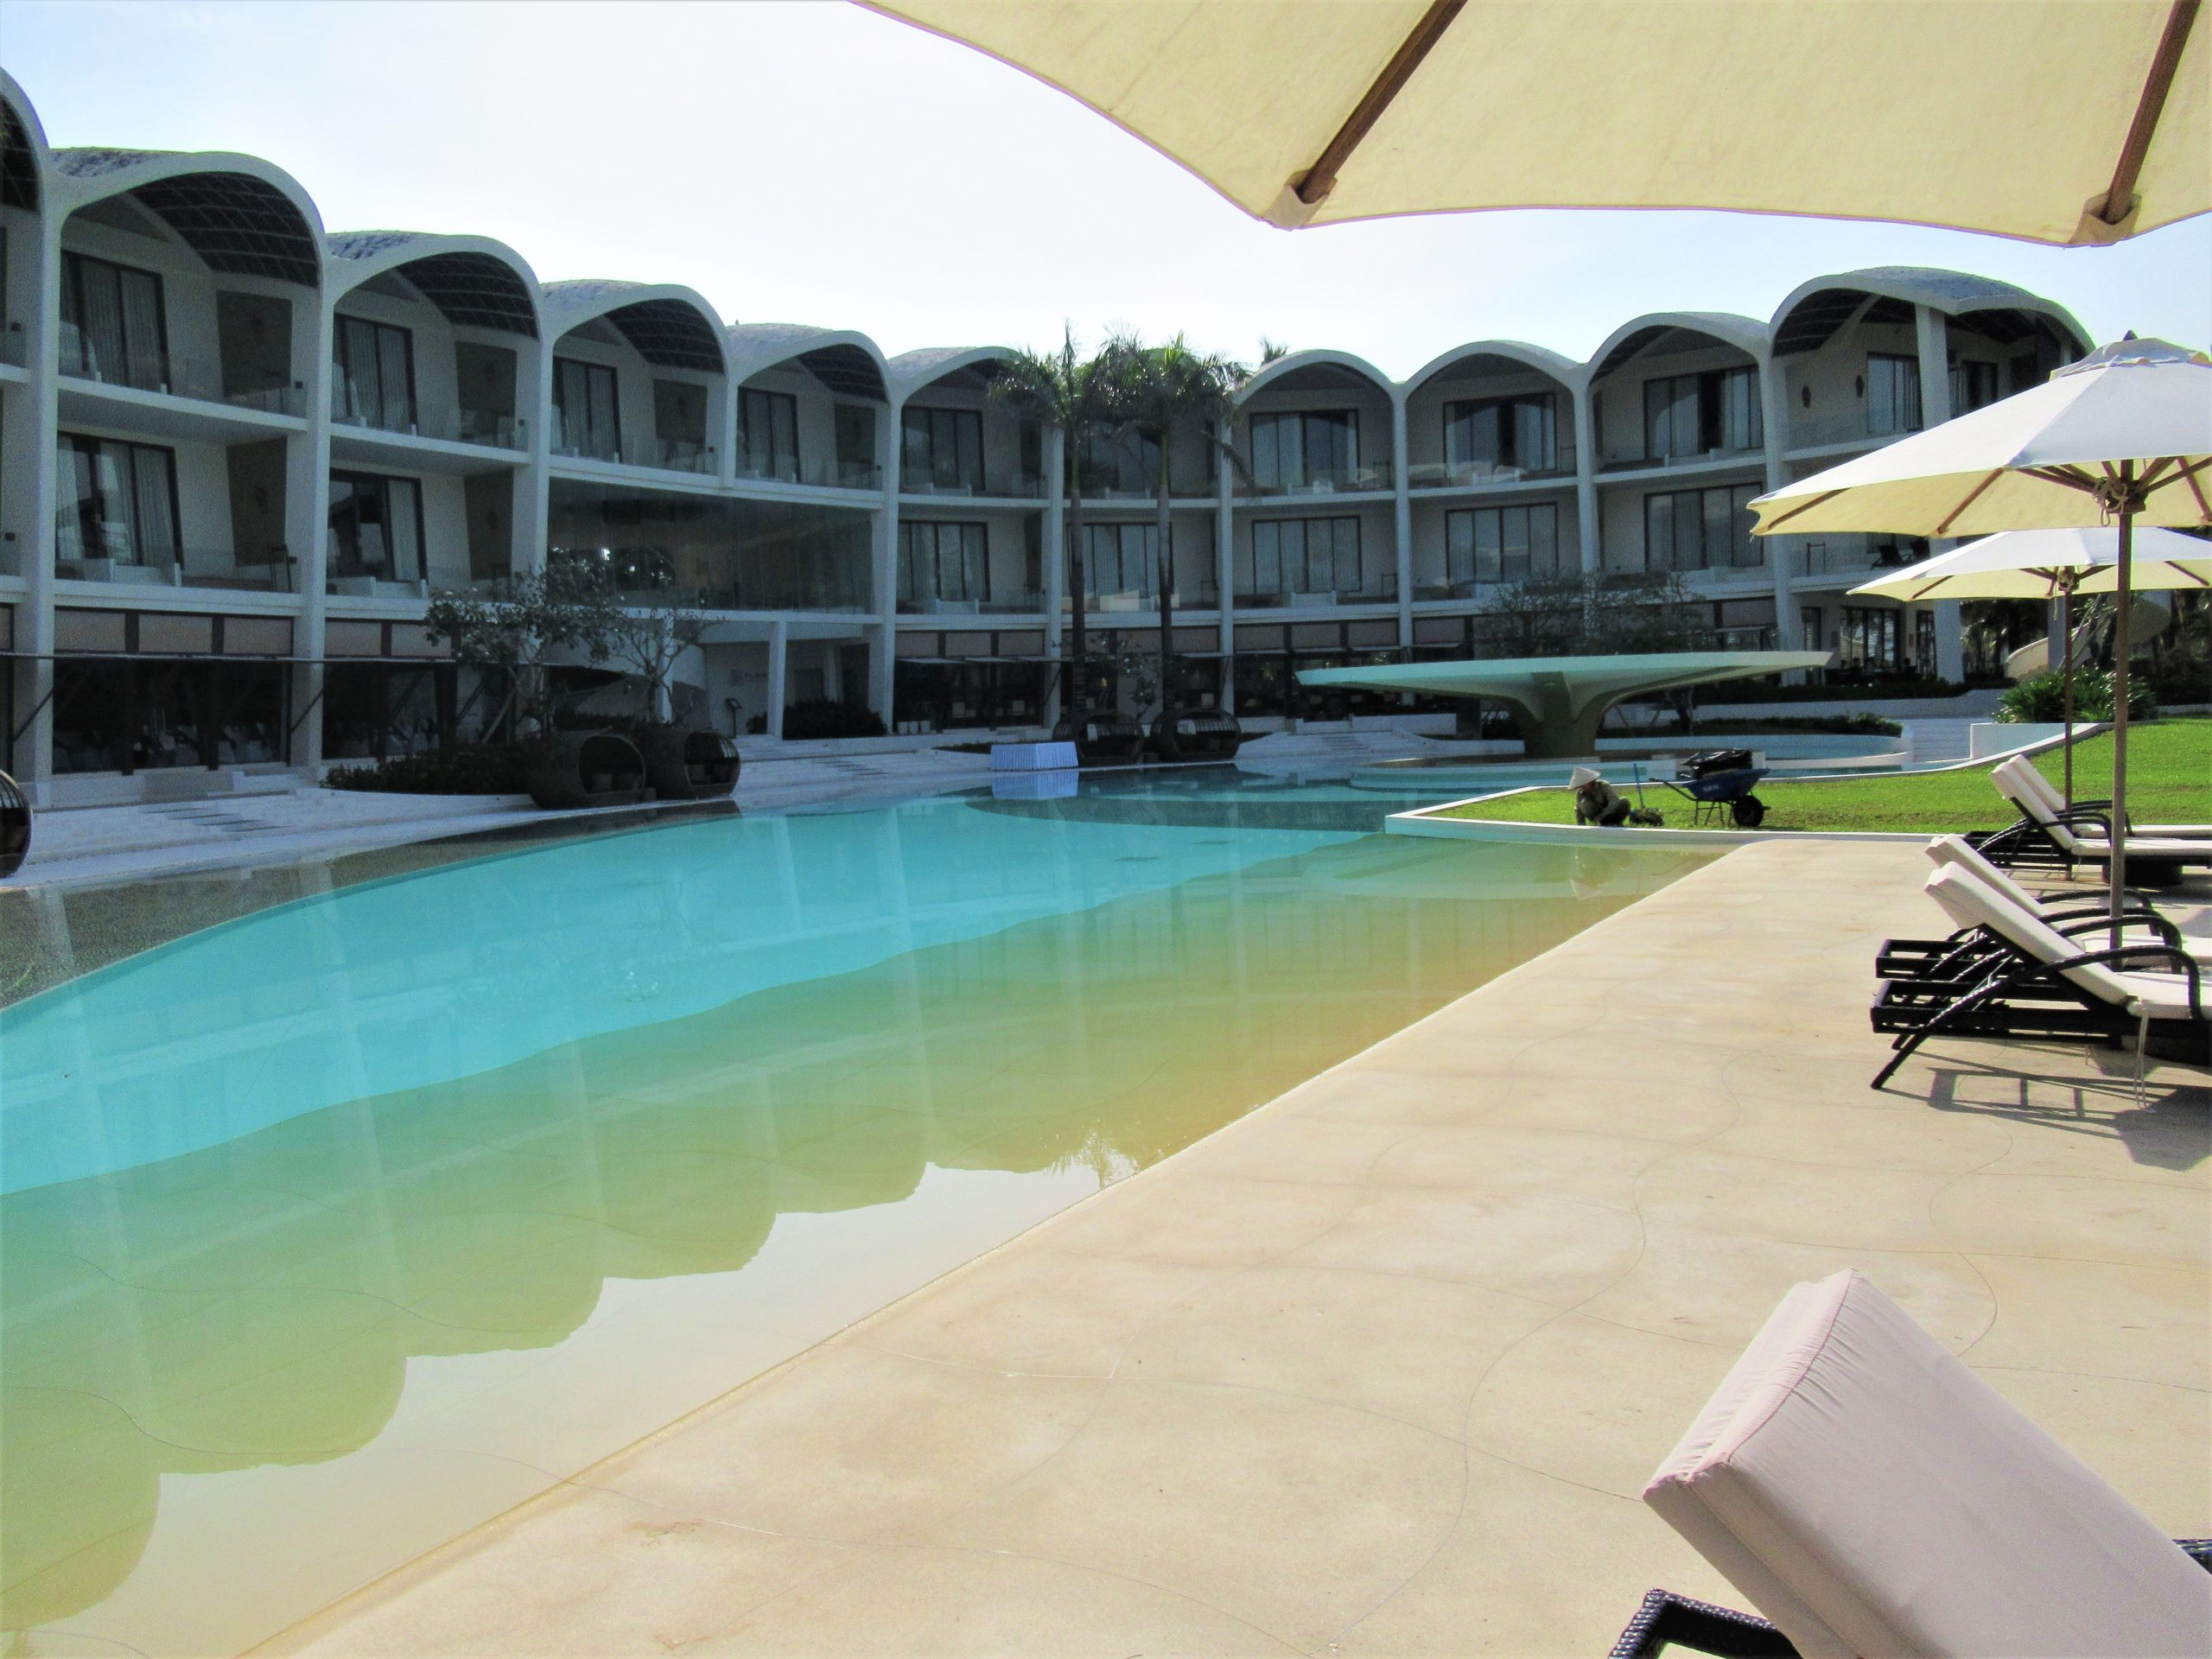 Main guest room structure, The Shells Resort, Phu Quoc Island, Vietnam